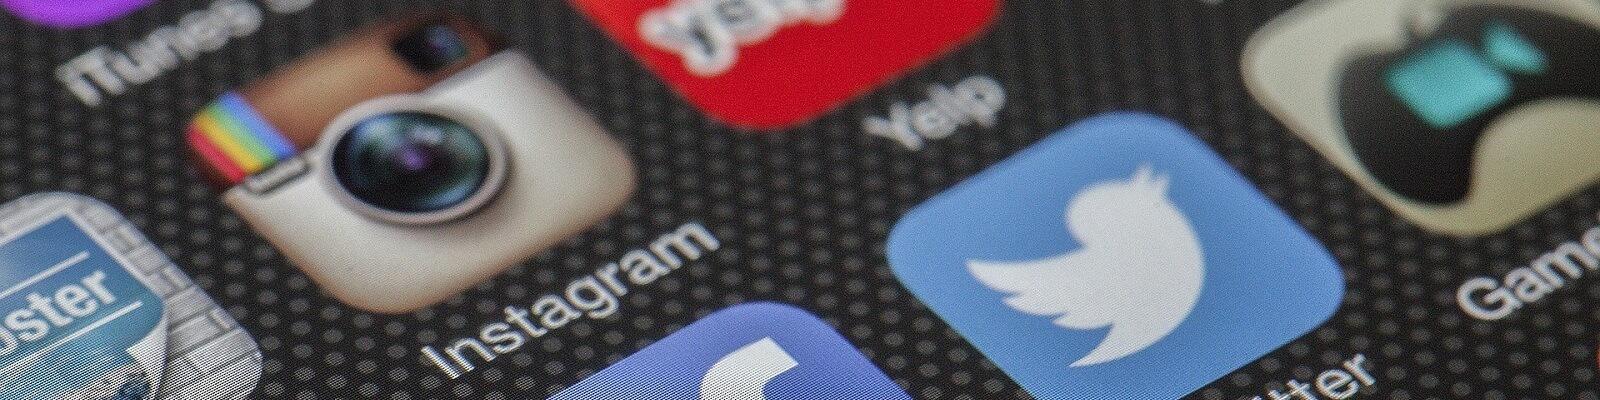 "Marketing no Instagram: Dicas de baixo custo<span class=""wtr-time-wrap after-title""><span class=""wtr-time-number"">6</span> minutos de leitura</span>"